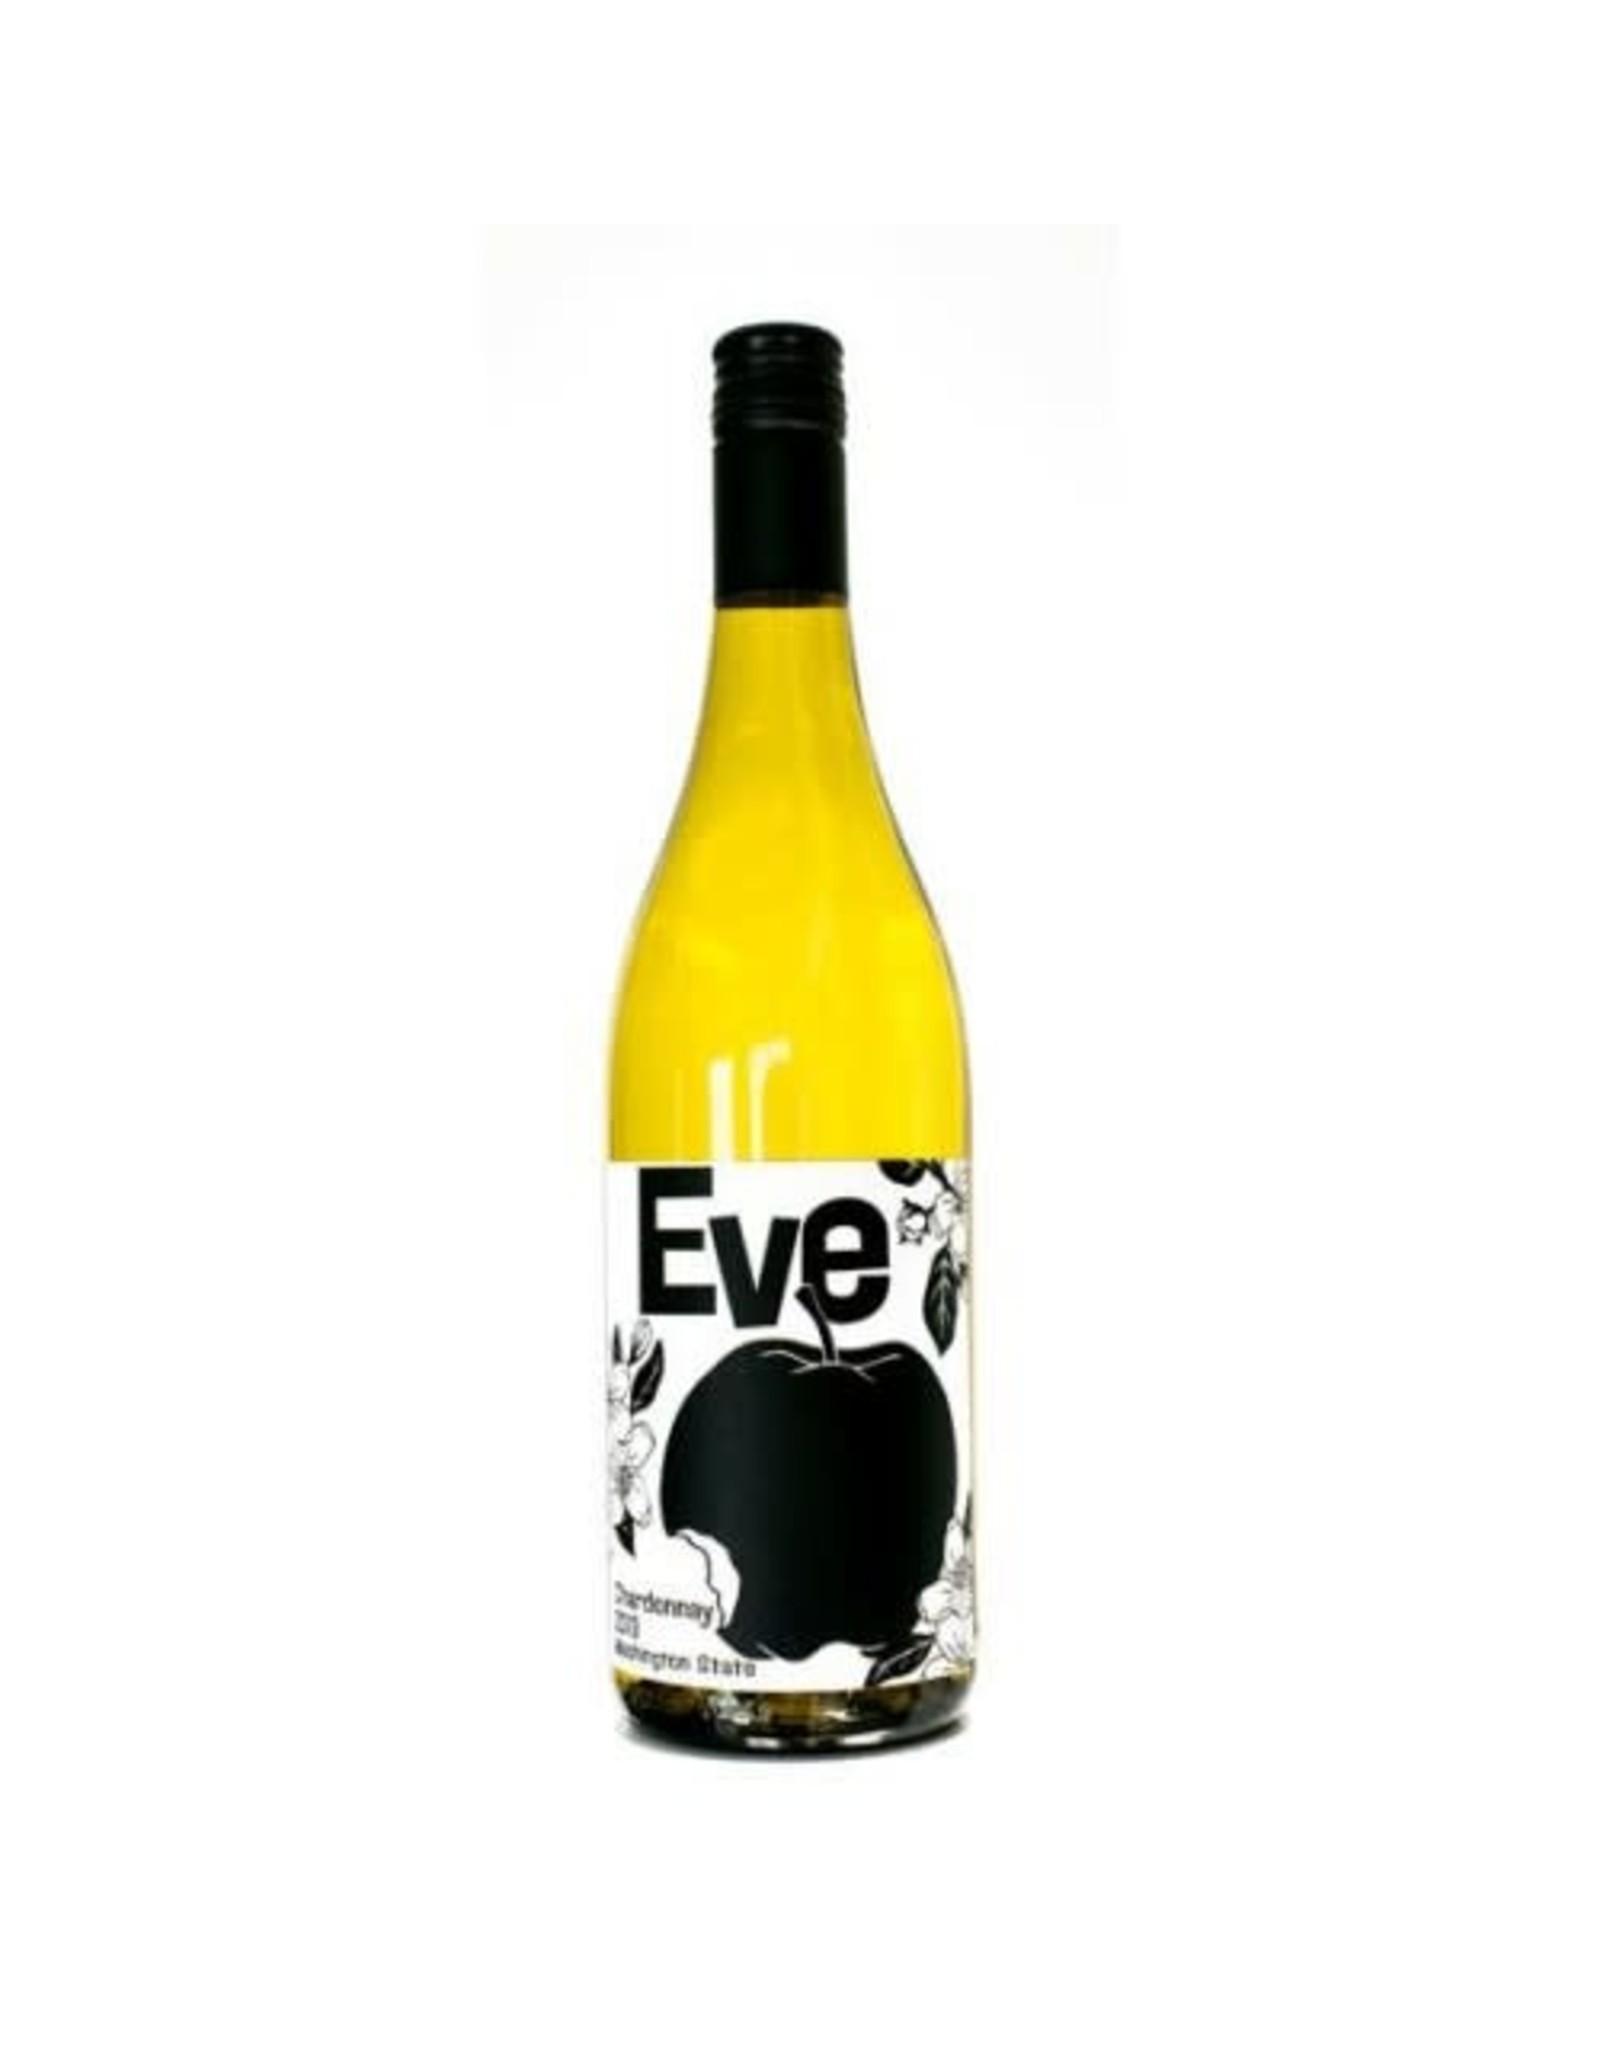 EVE CHARDONNAY 750ML